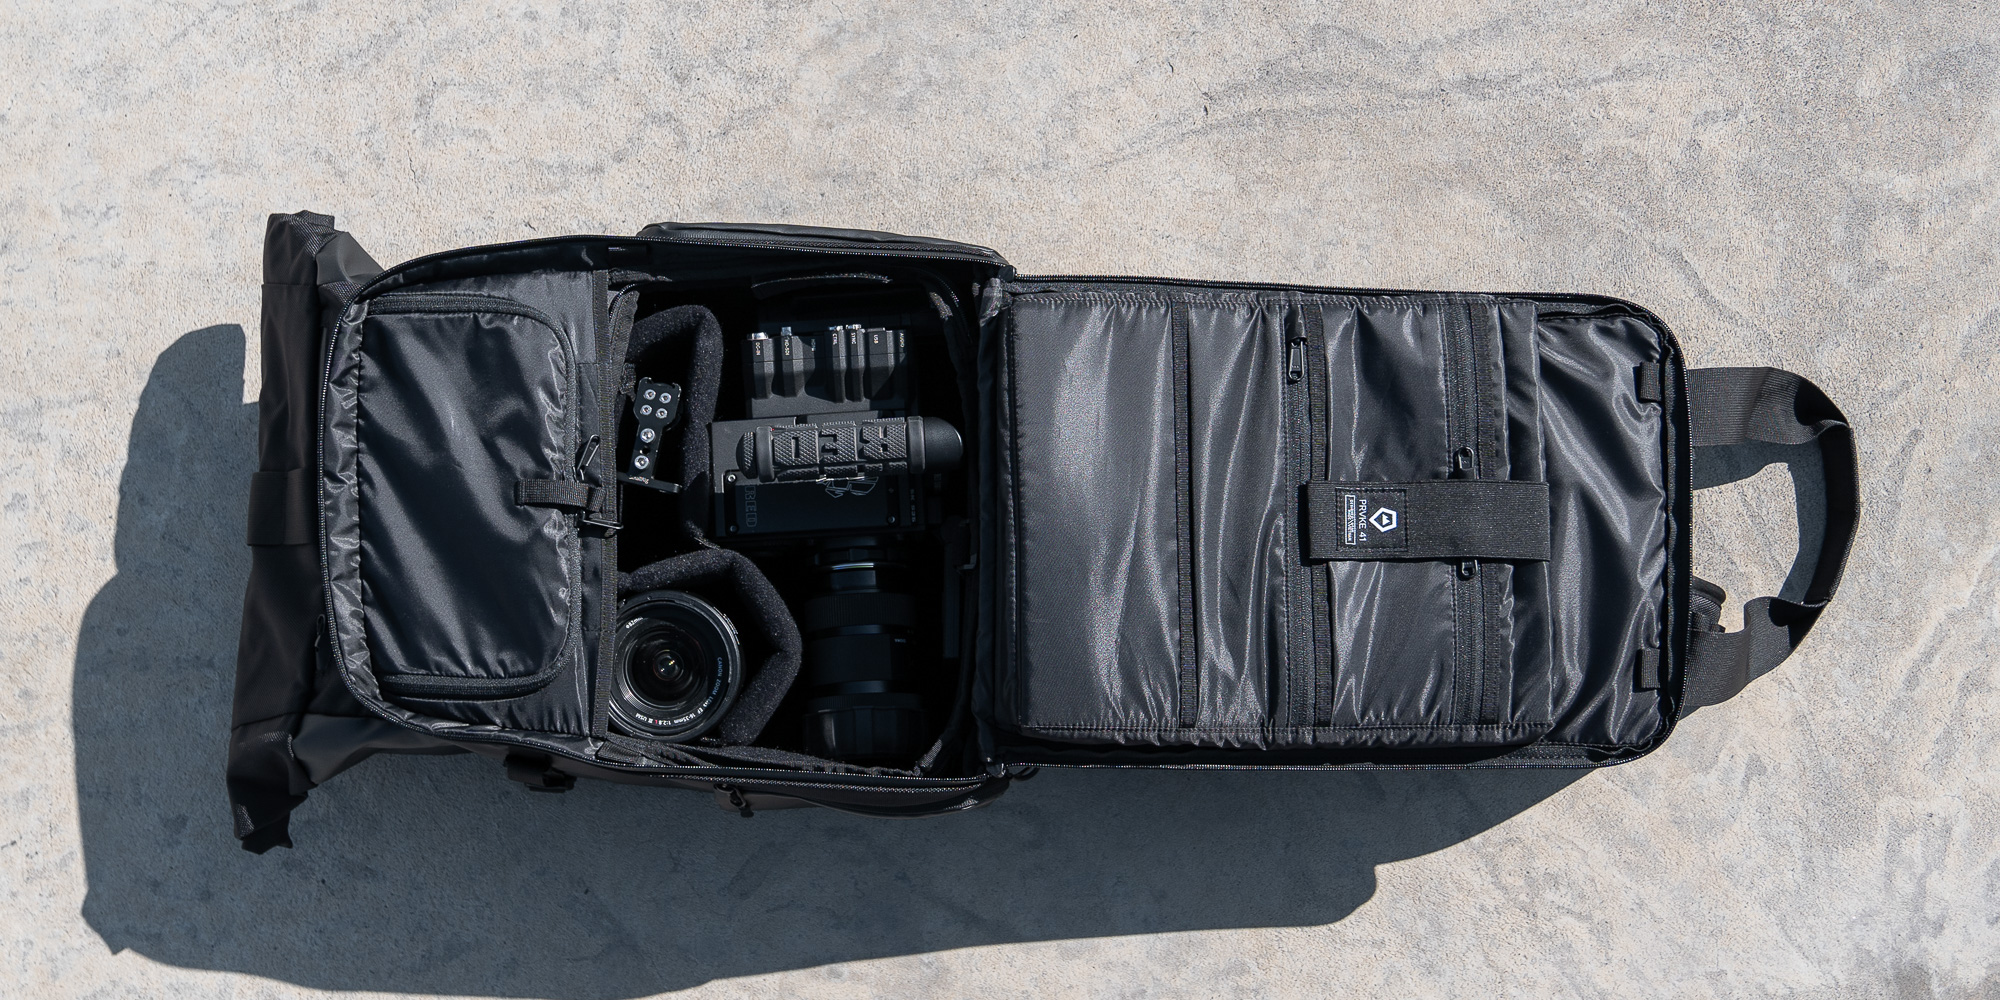 Wandrd All-new Prvke 41 Backpack - Photographer's Essentials